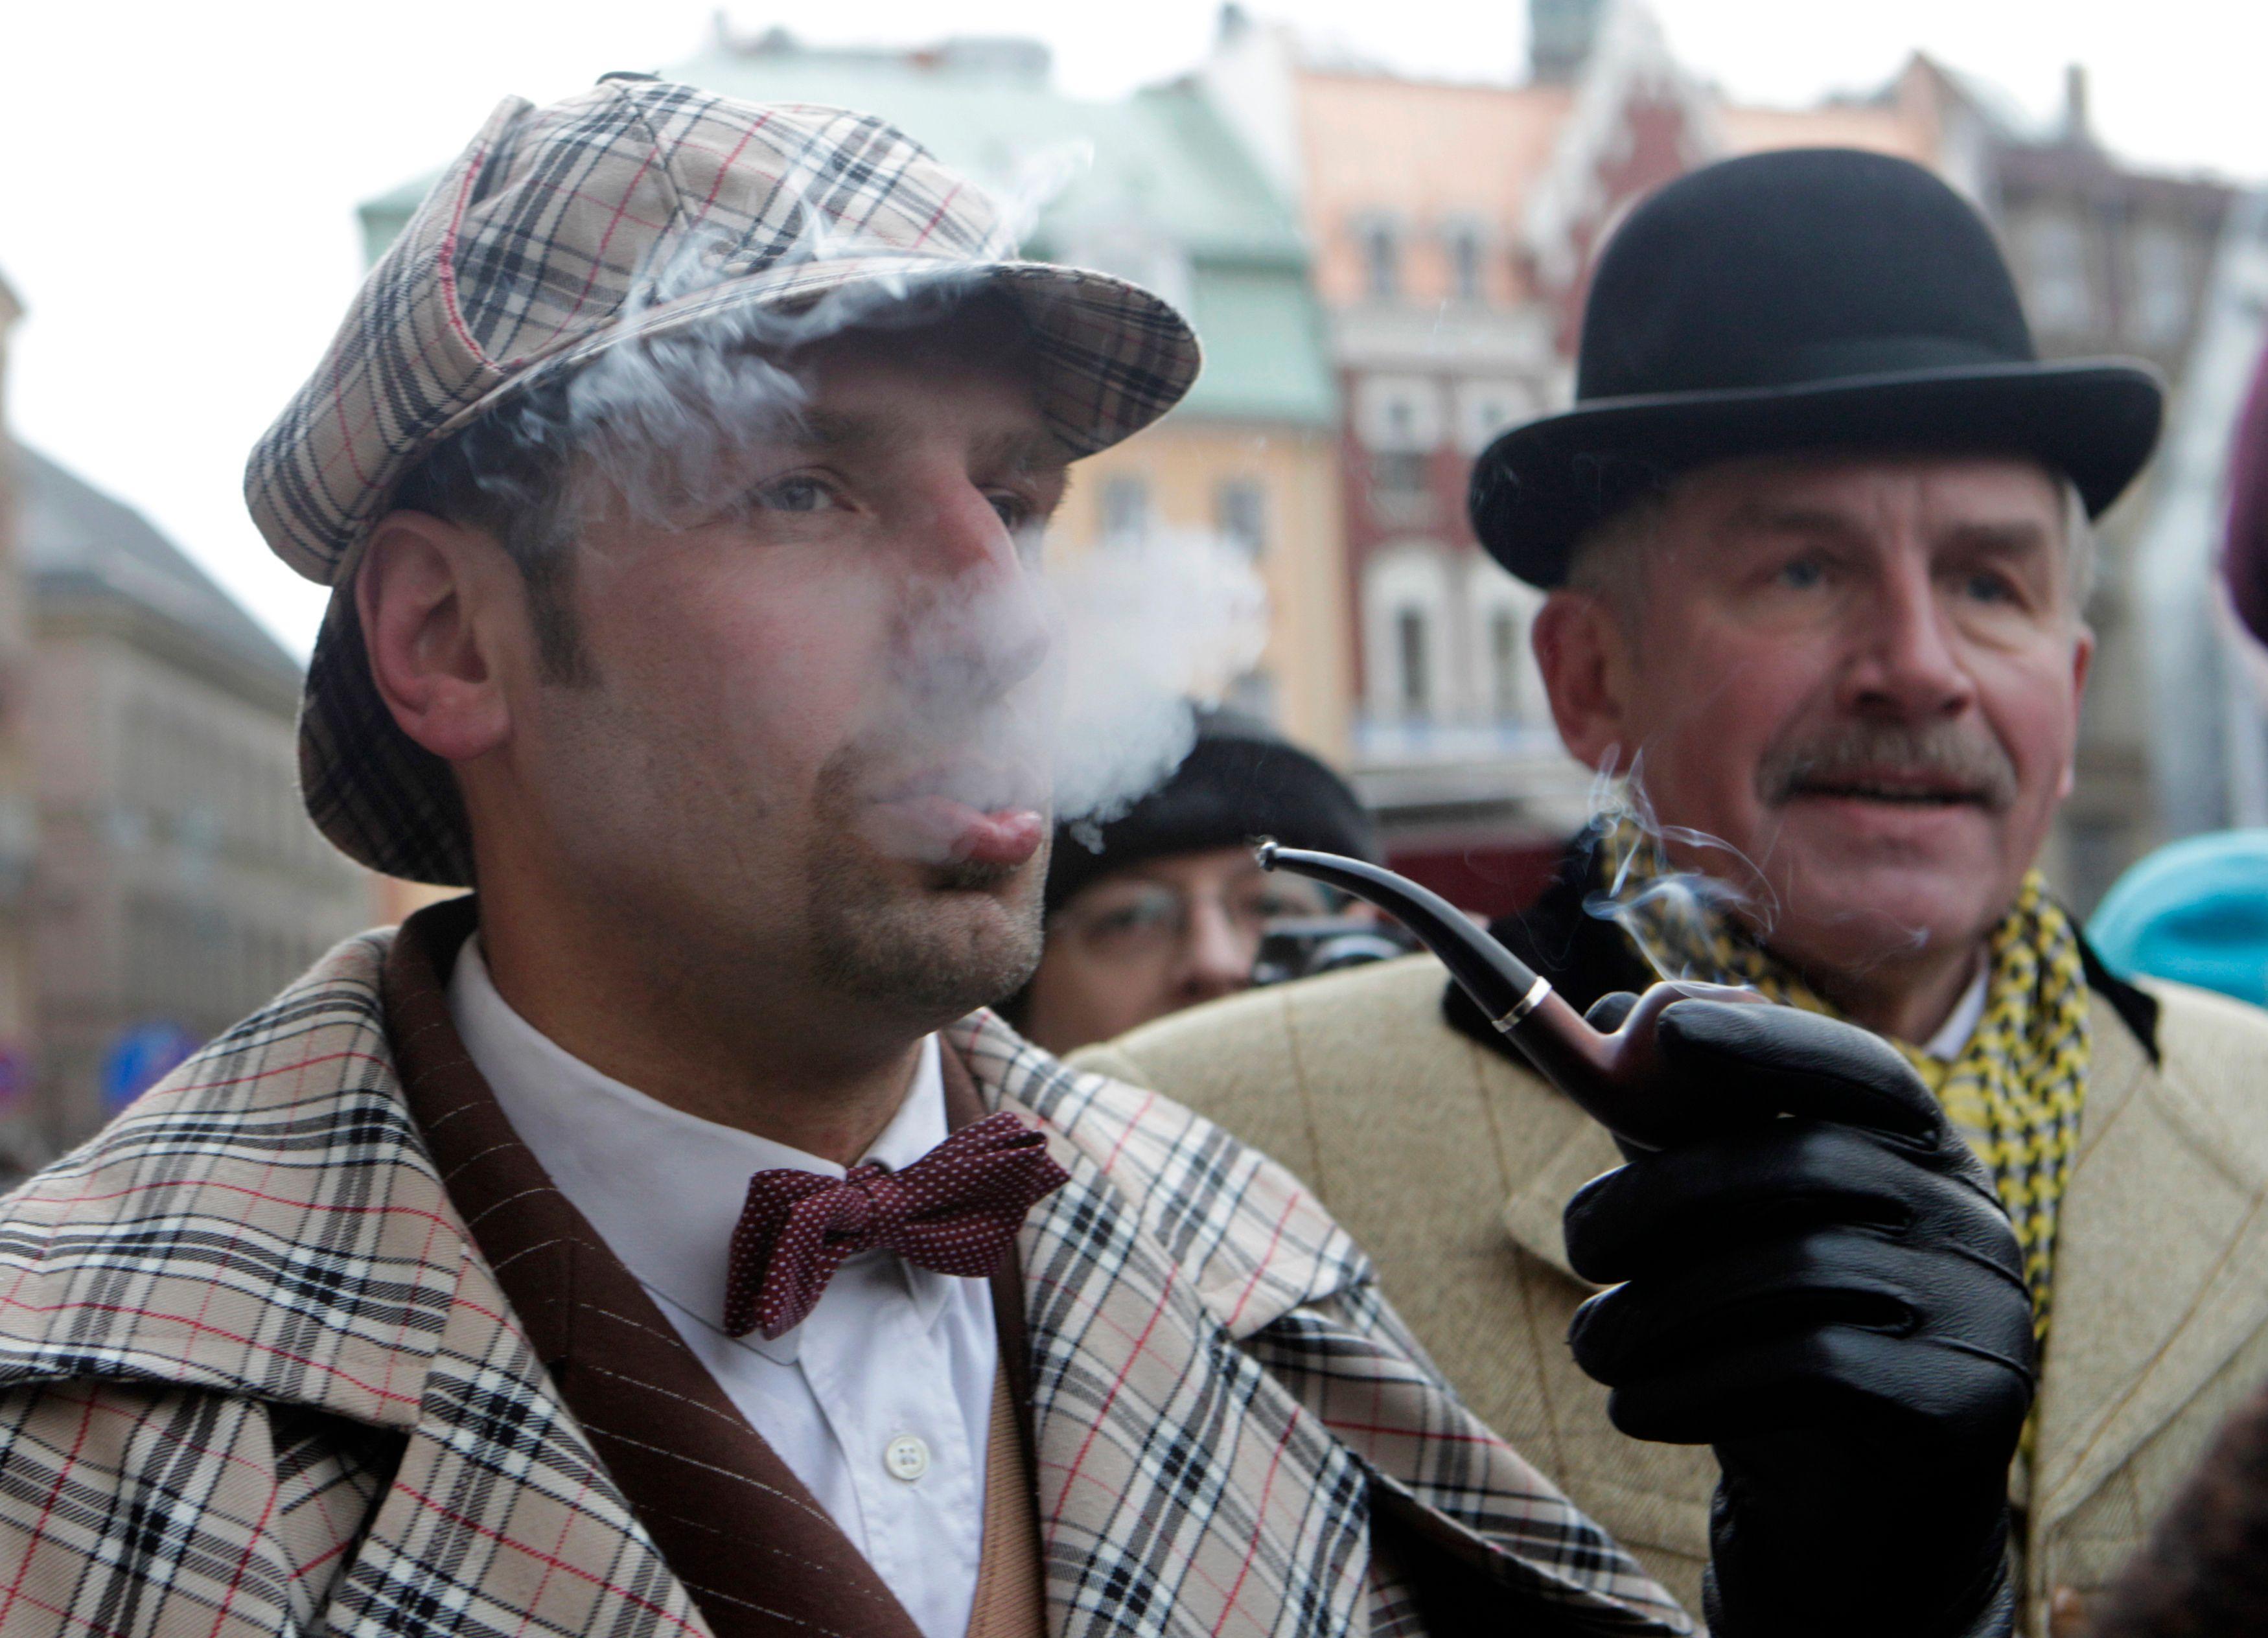 Comment penser comme Sherlock Holmes ?